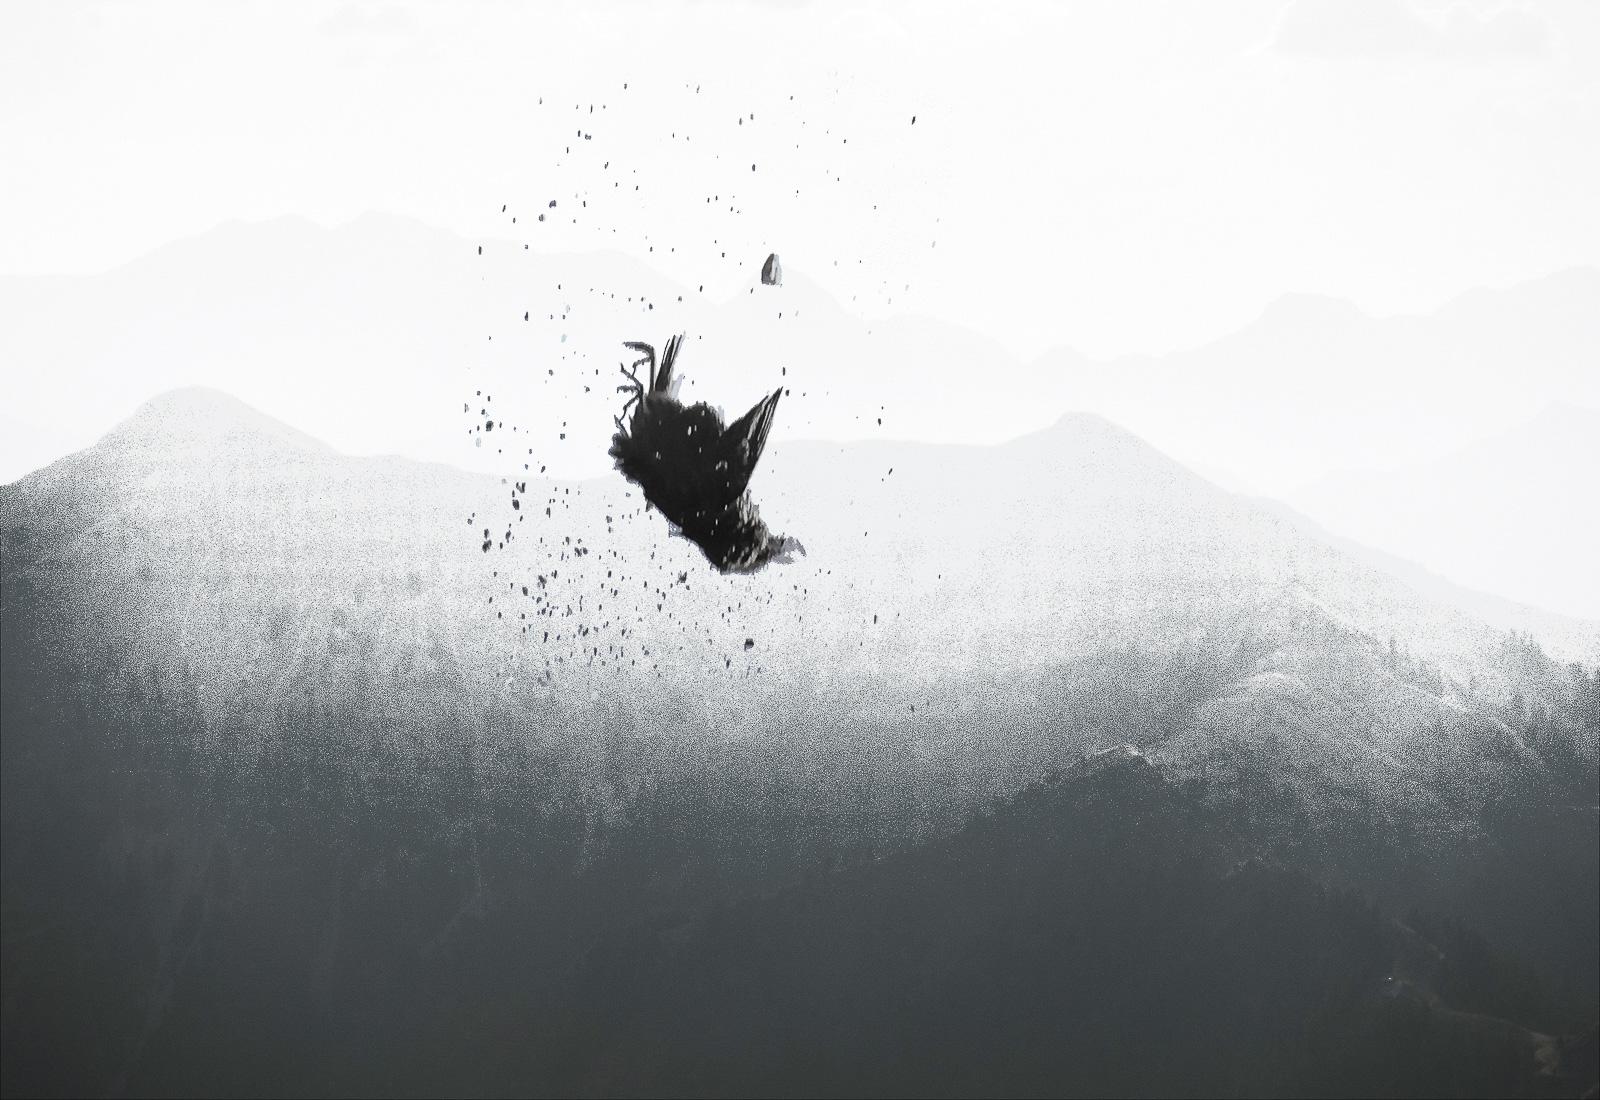 From the series Nanuu by Irina Vosgerau